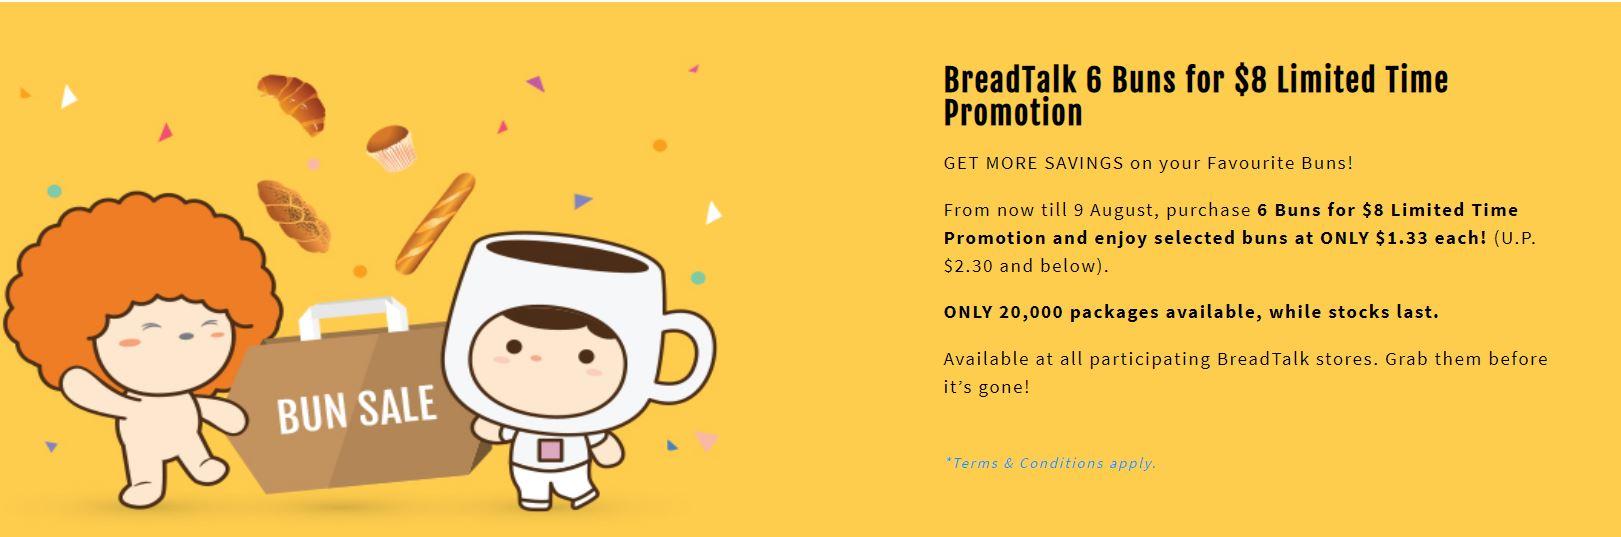 breadtalk promotion 6 buns for 8 - 2